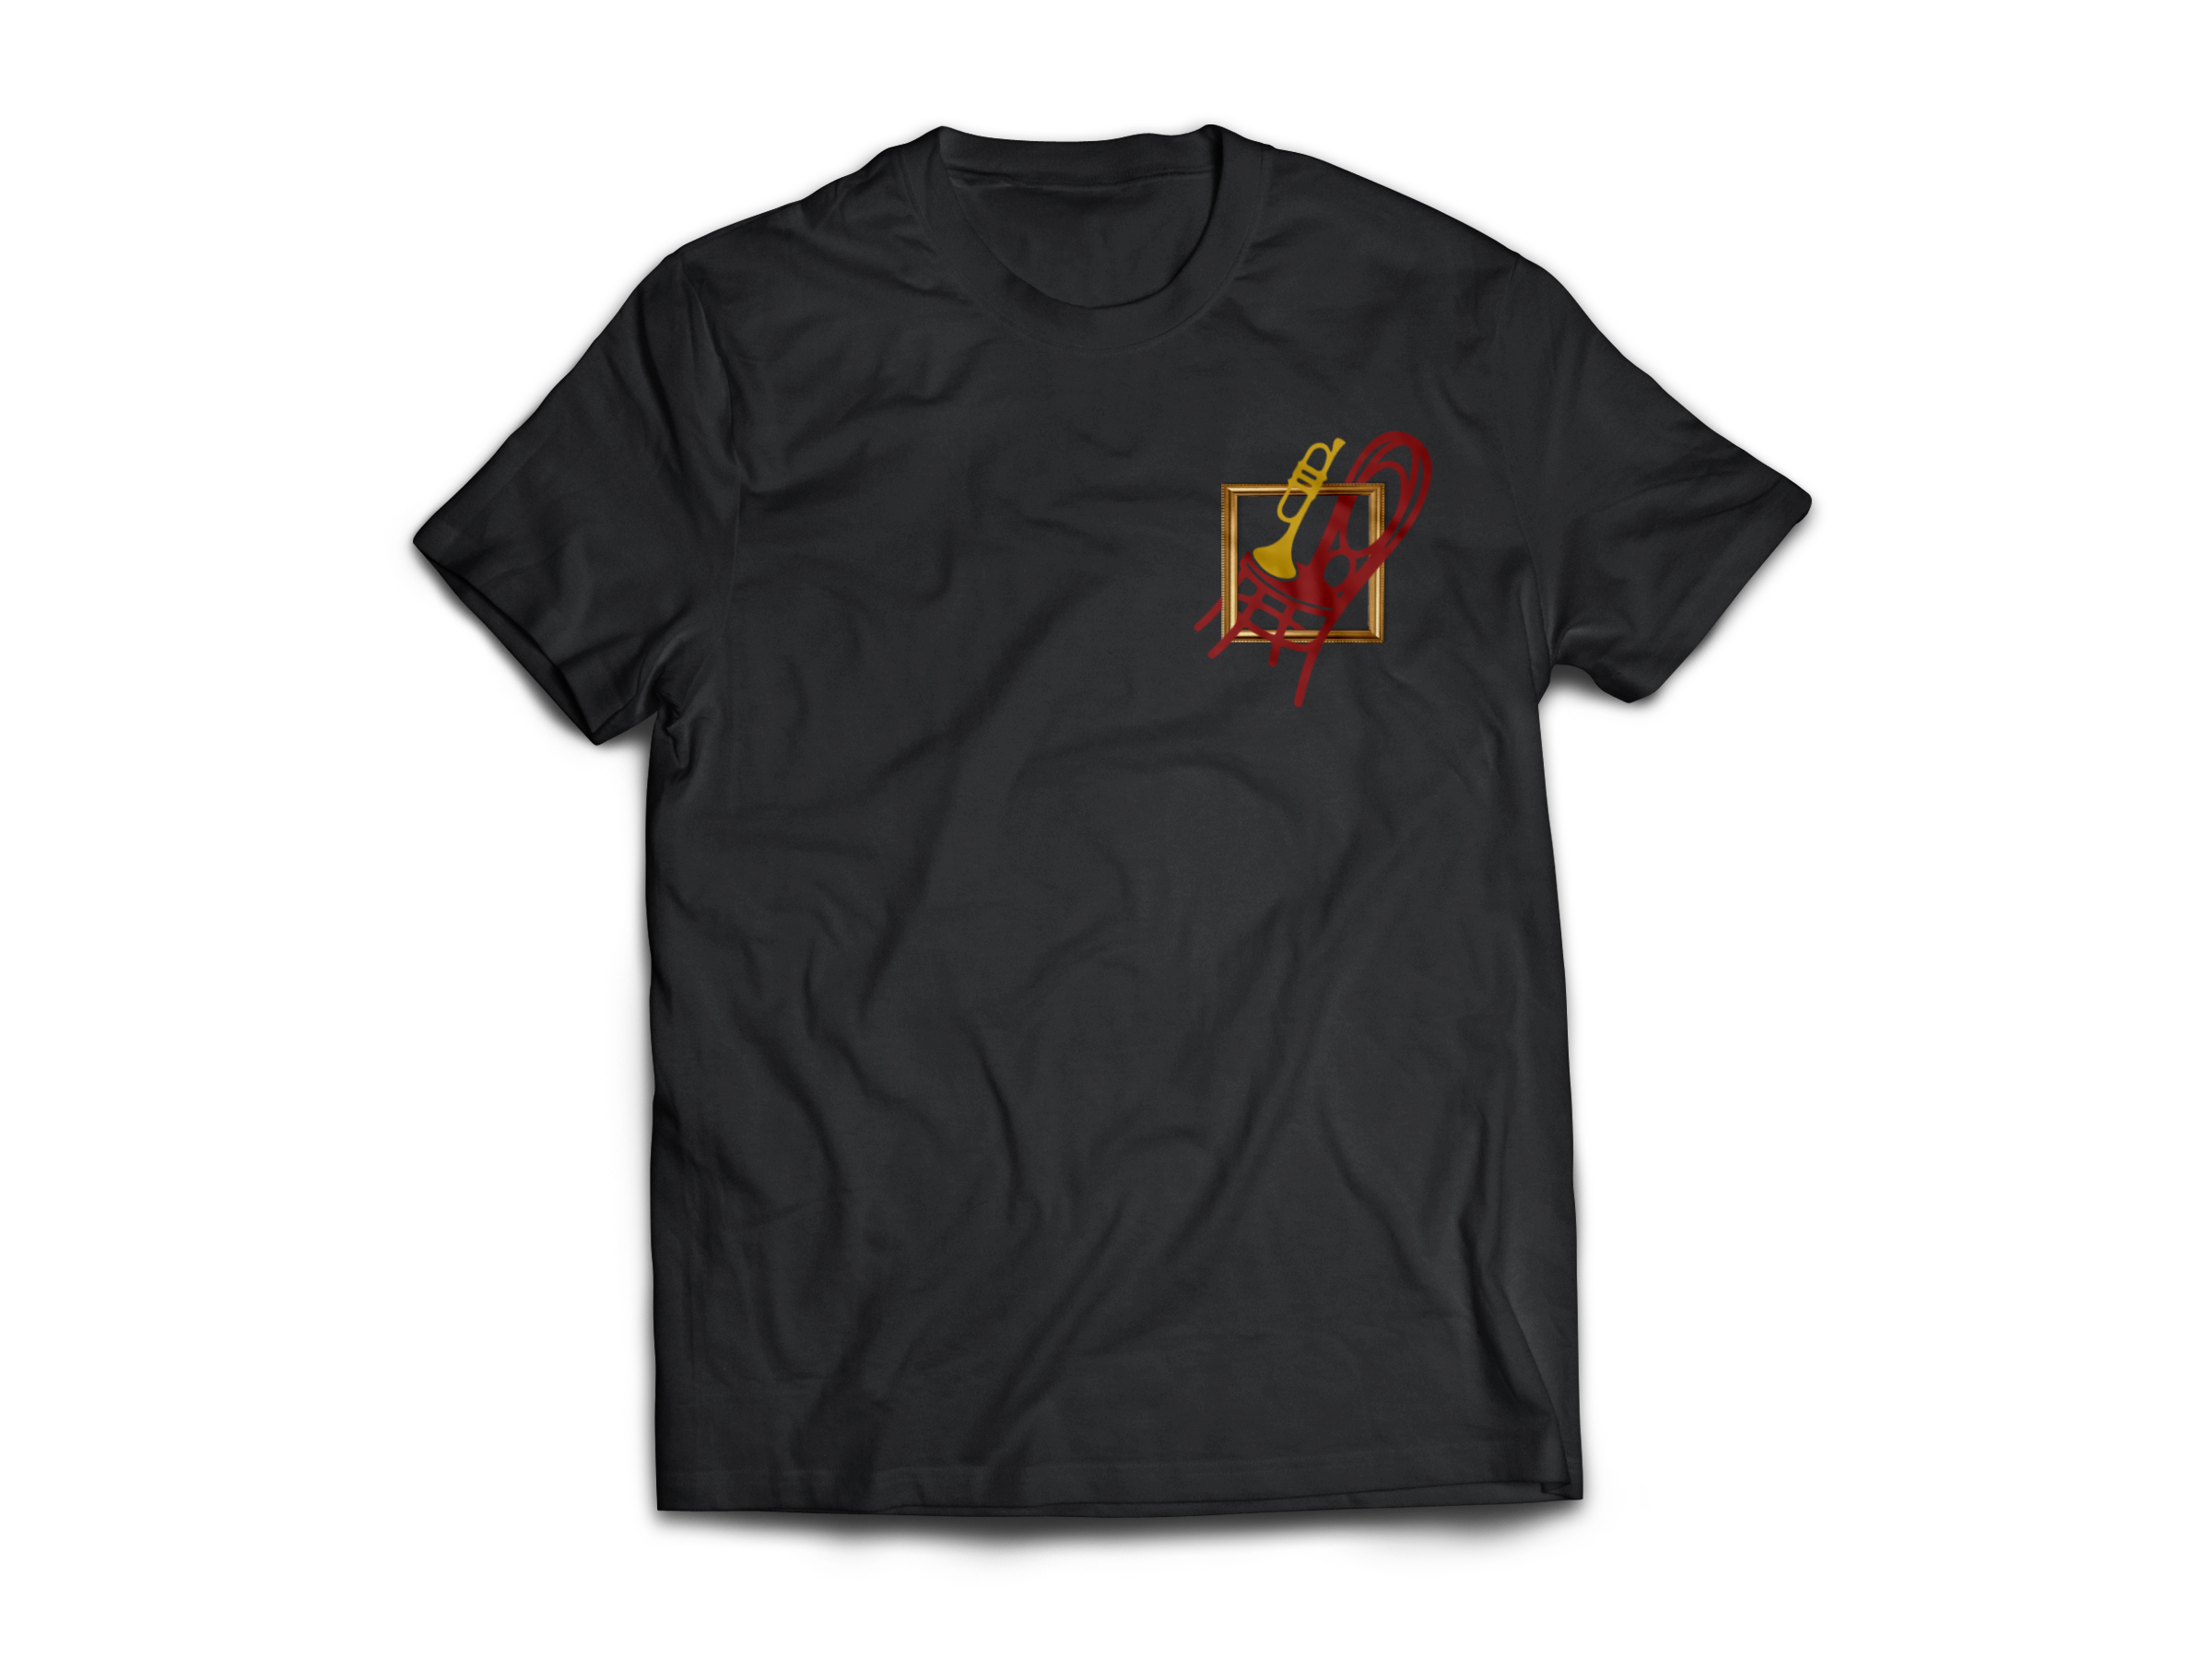 front t shirt design